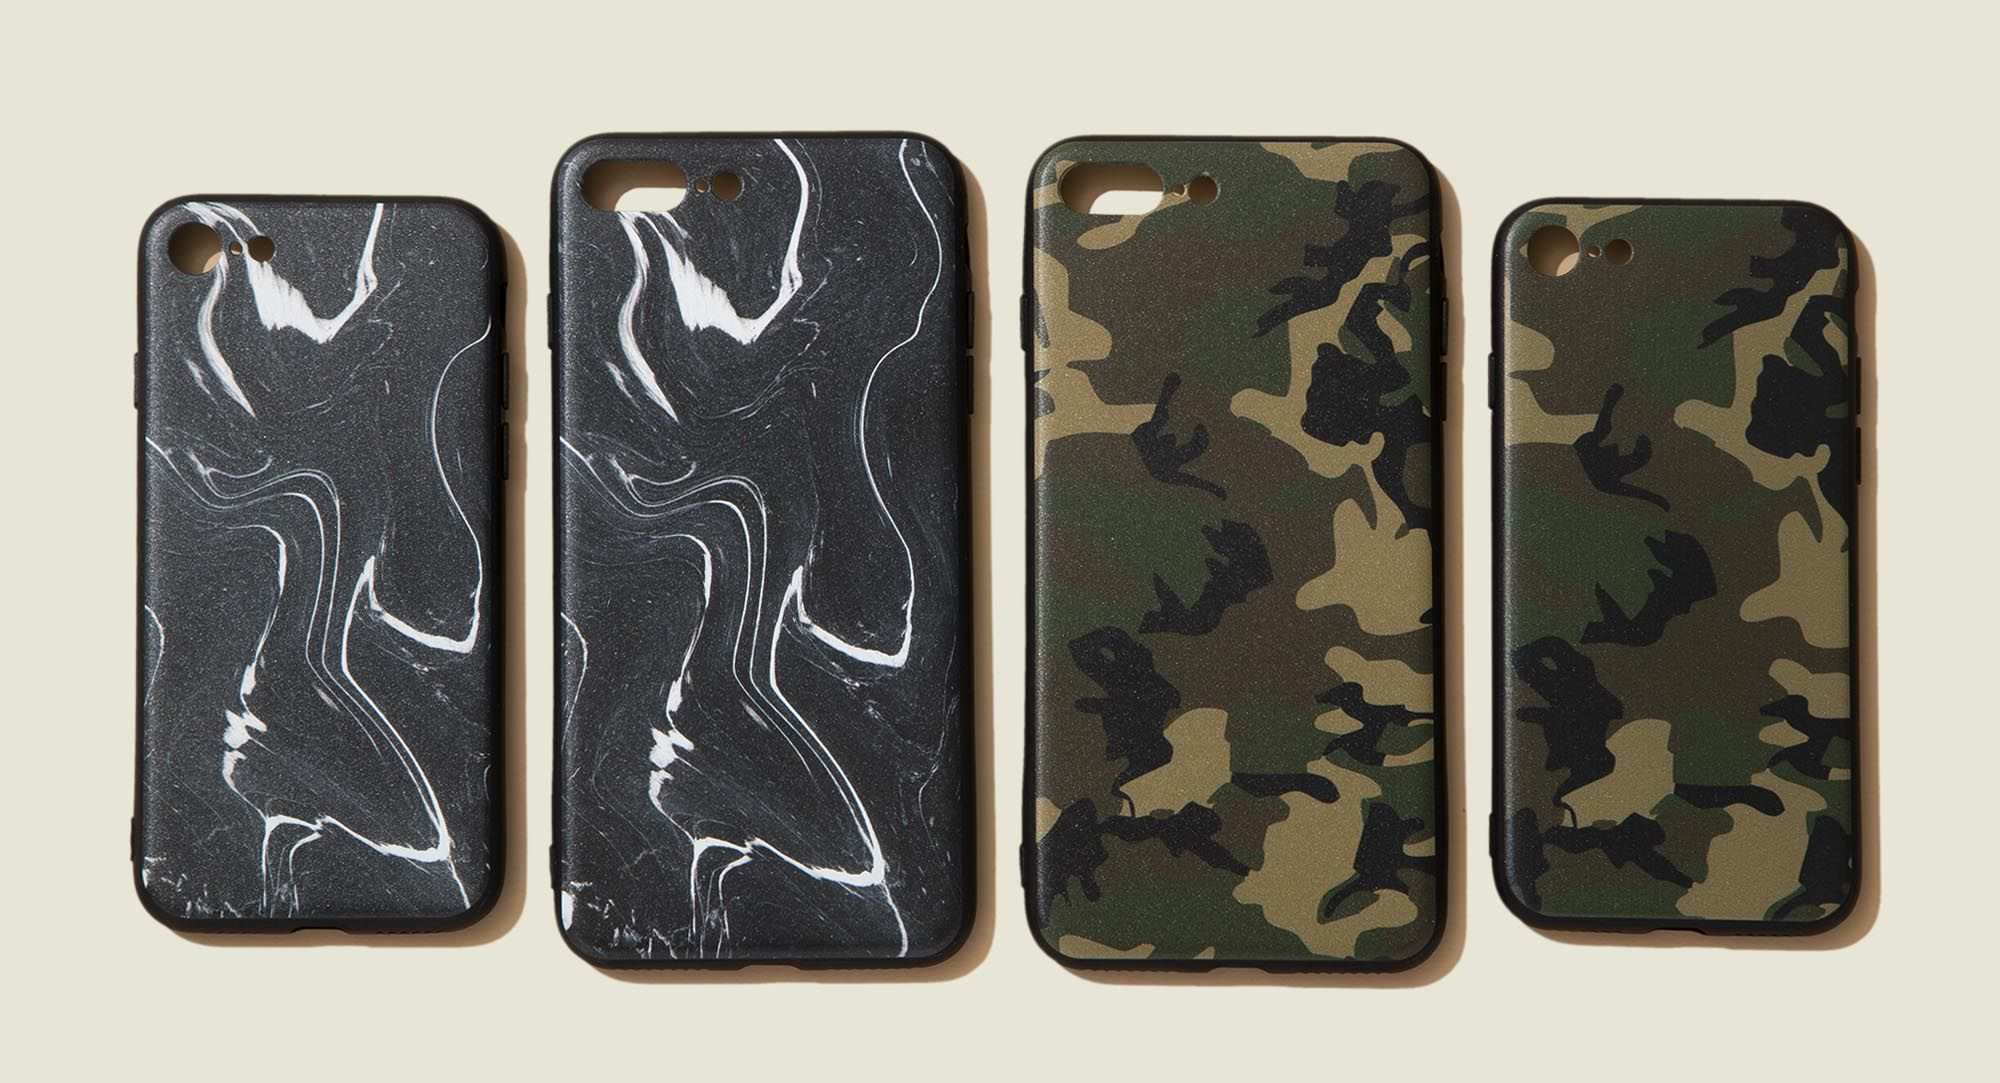 Set of phones cases